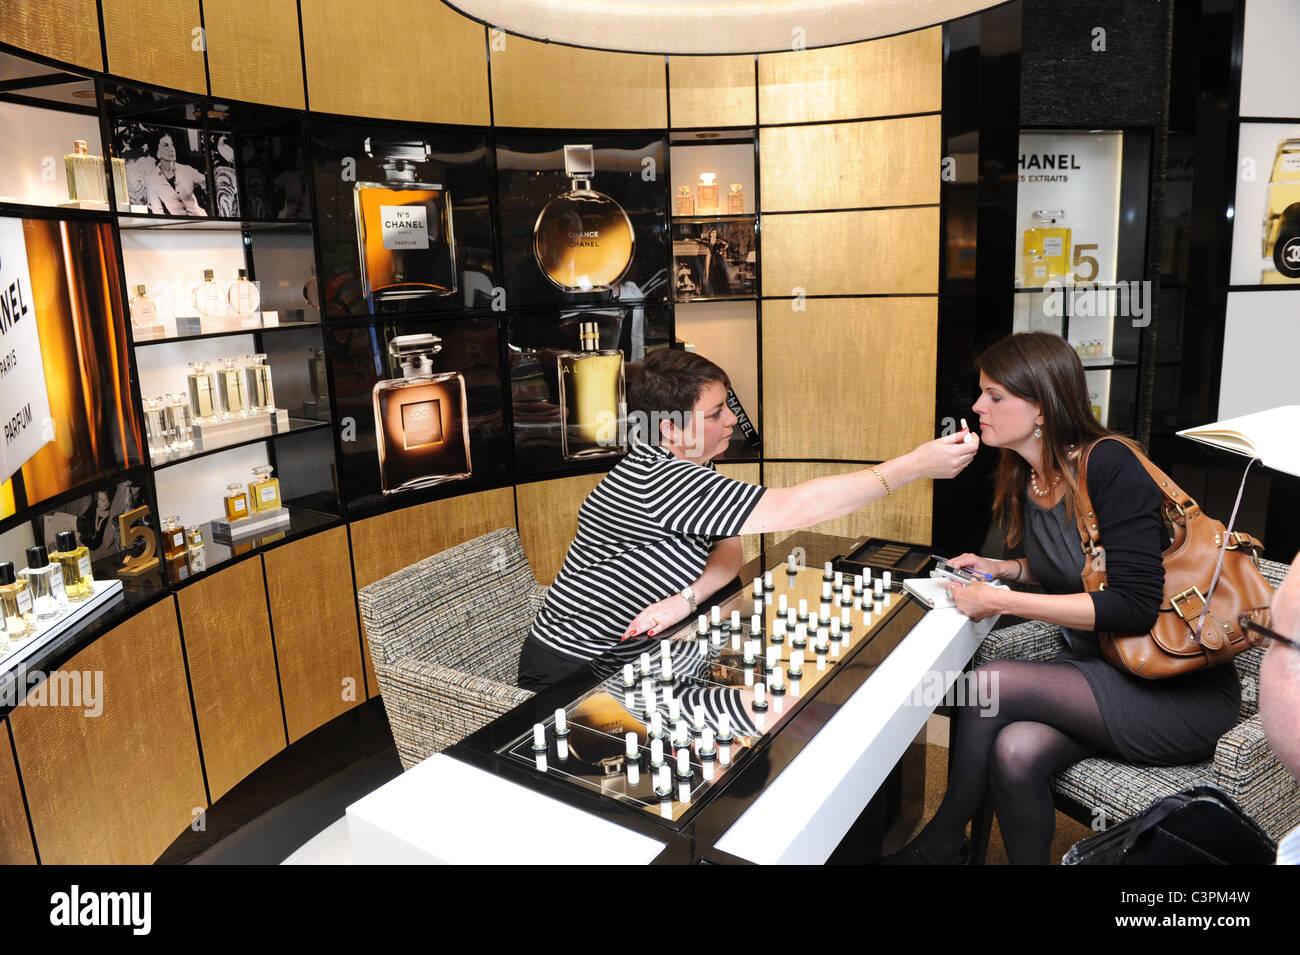 Chanel perfume testing at Birmingham Airport duty free shop England Uk - Stock Image